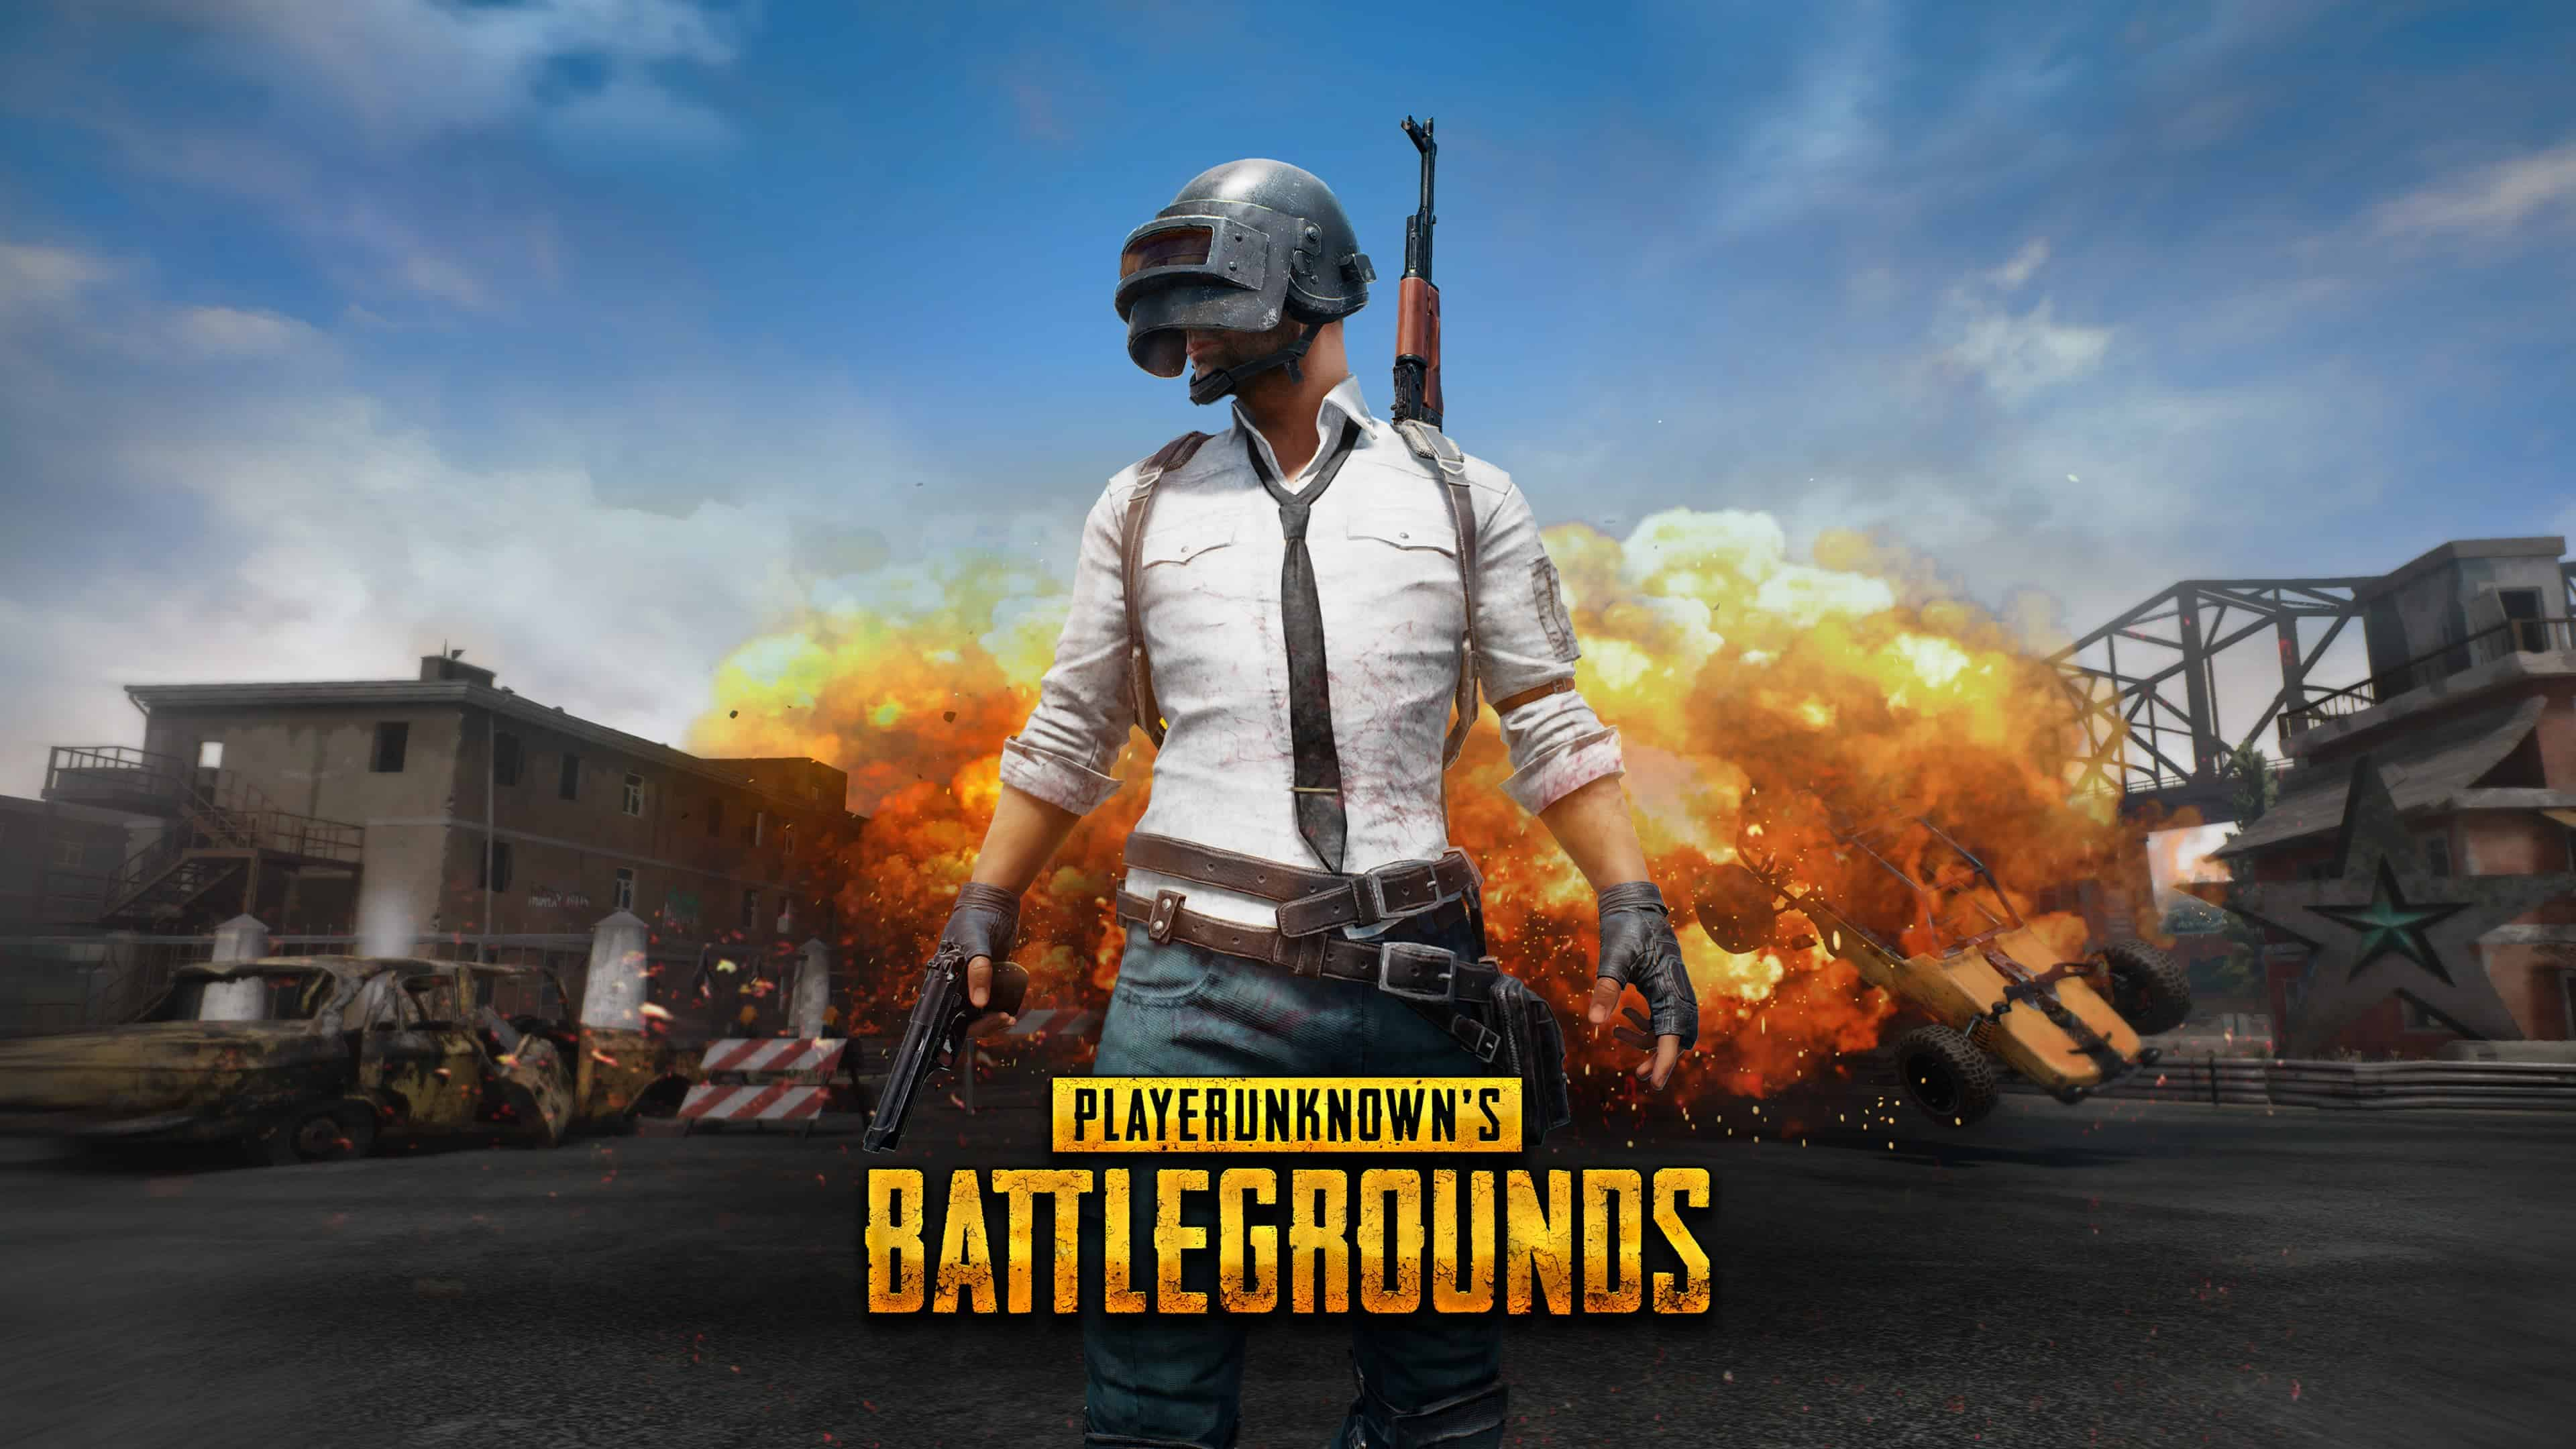 PUBG Player Unknown Battlegrounds Cover UHD 4K Wallpaper Pixelz 3840x2160